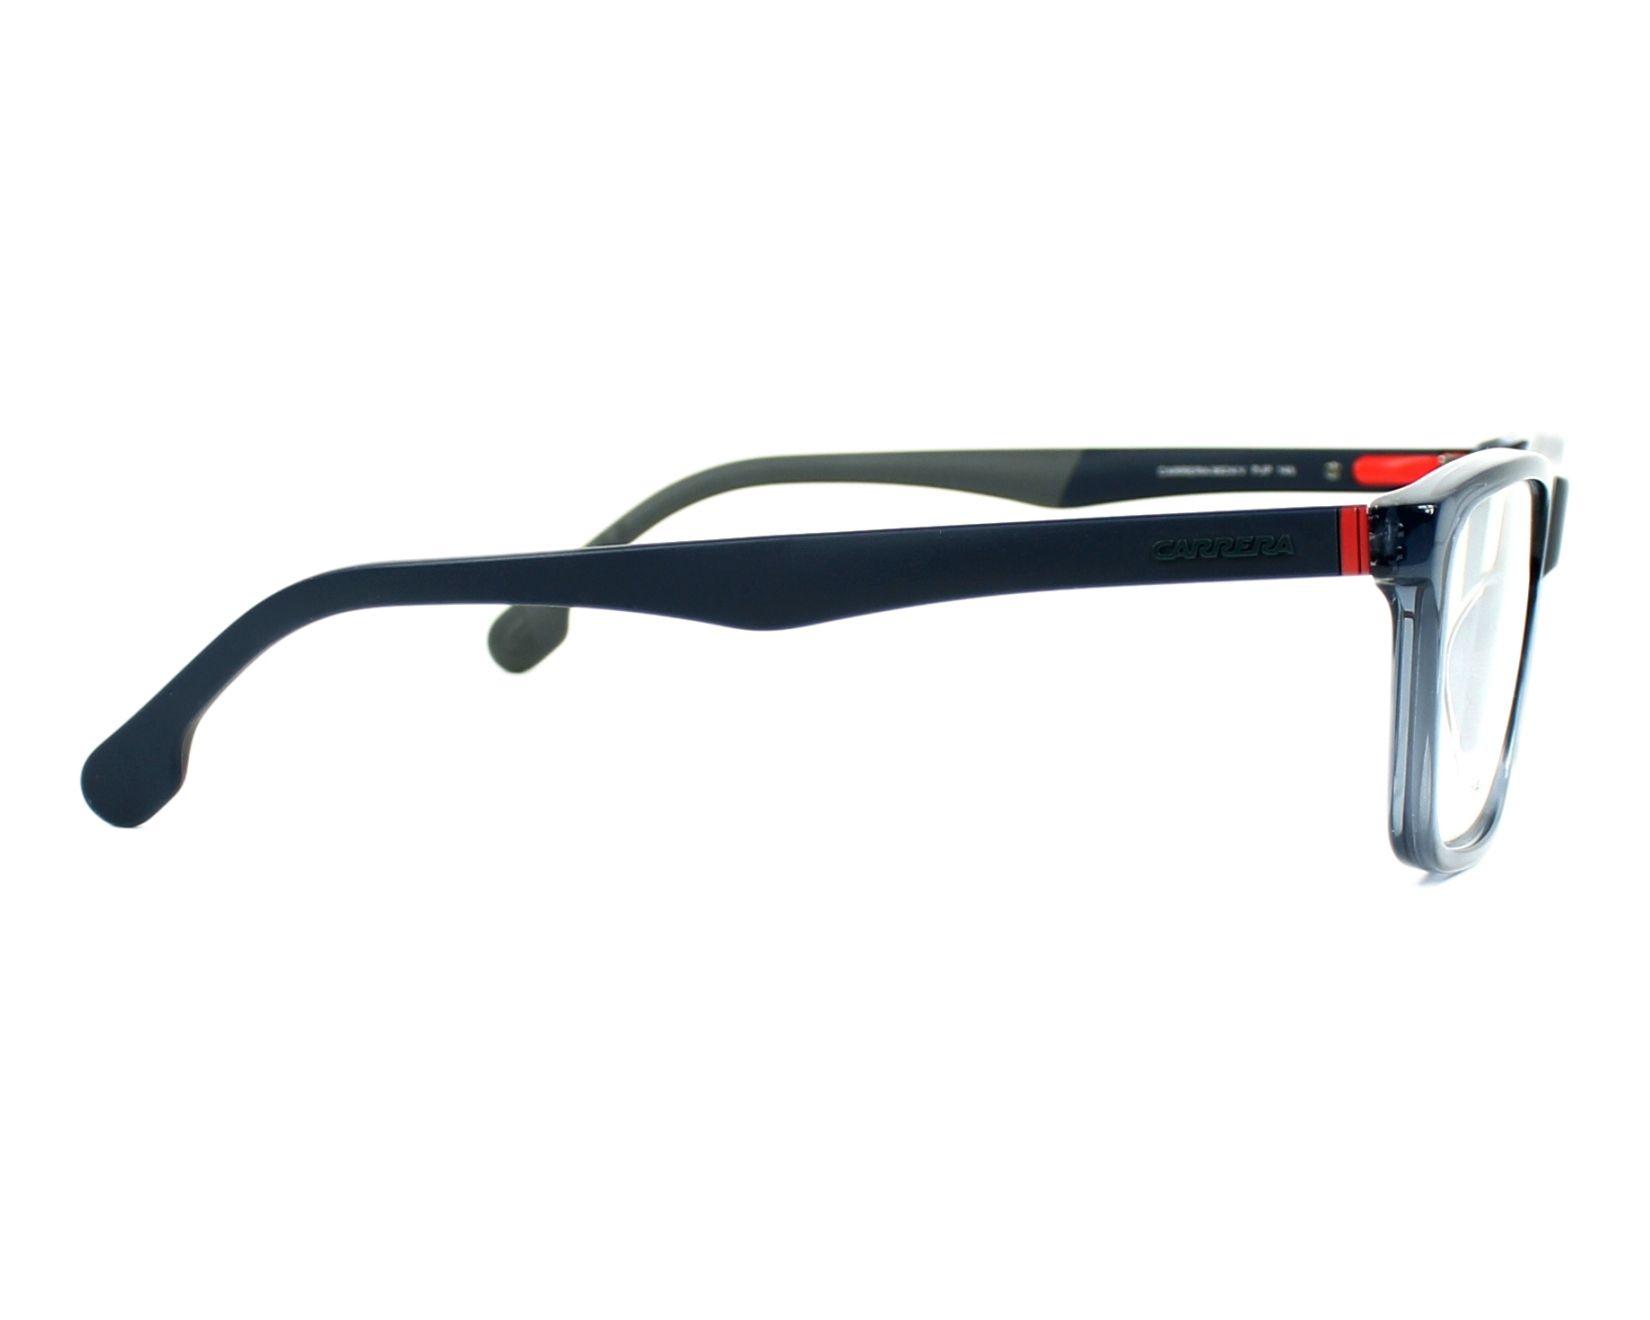 2fa899ff9a4ed Carrera Eyeglasses CA 8824 V PJP Blue Visionet